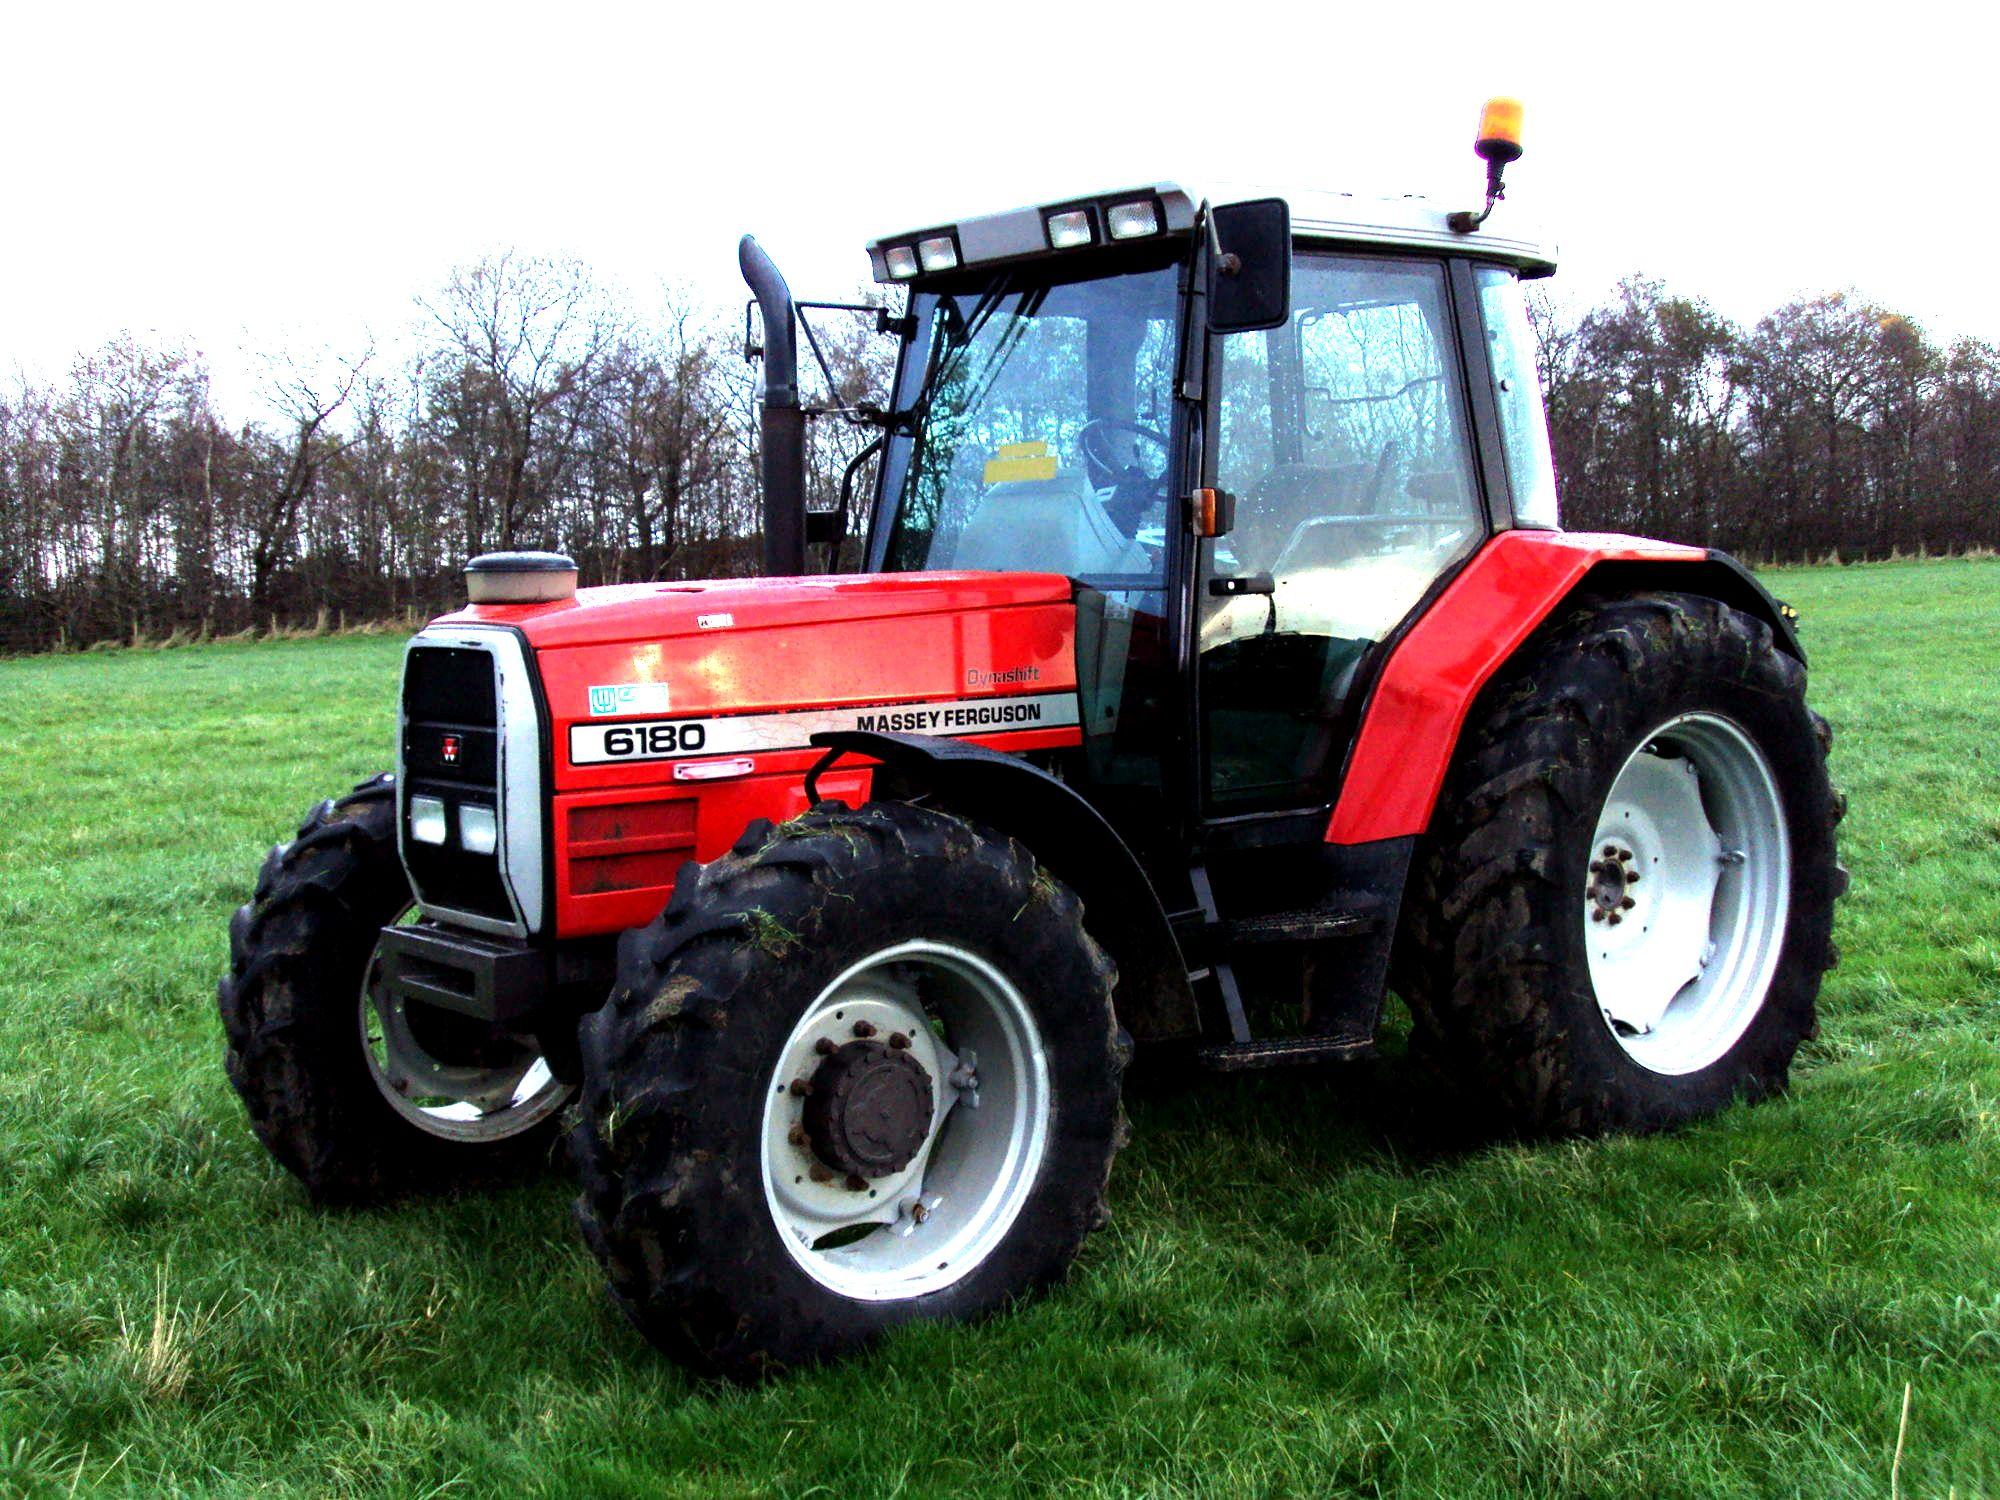 Massey Ferguson 6180 Dynashift Tractors Massey Ferguson Farm Machinery